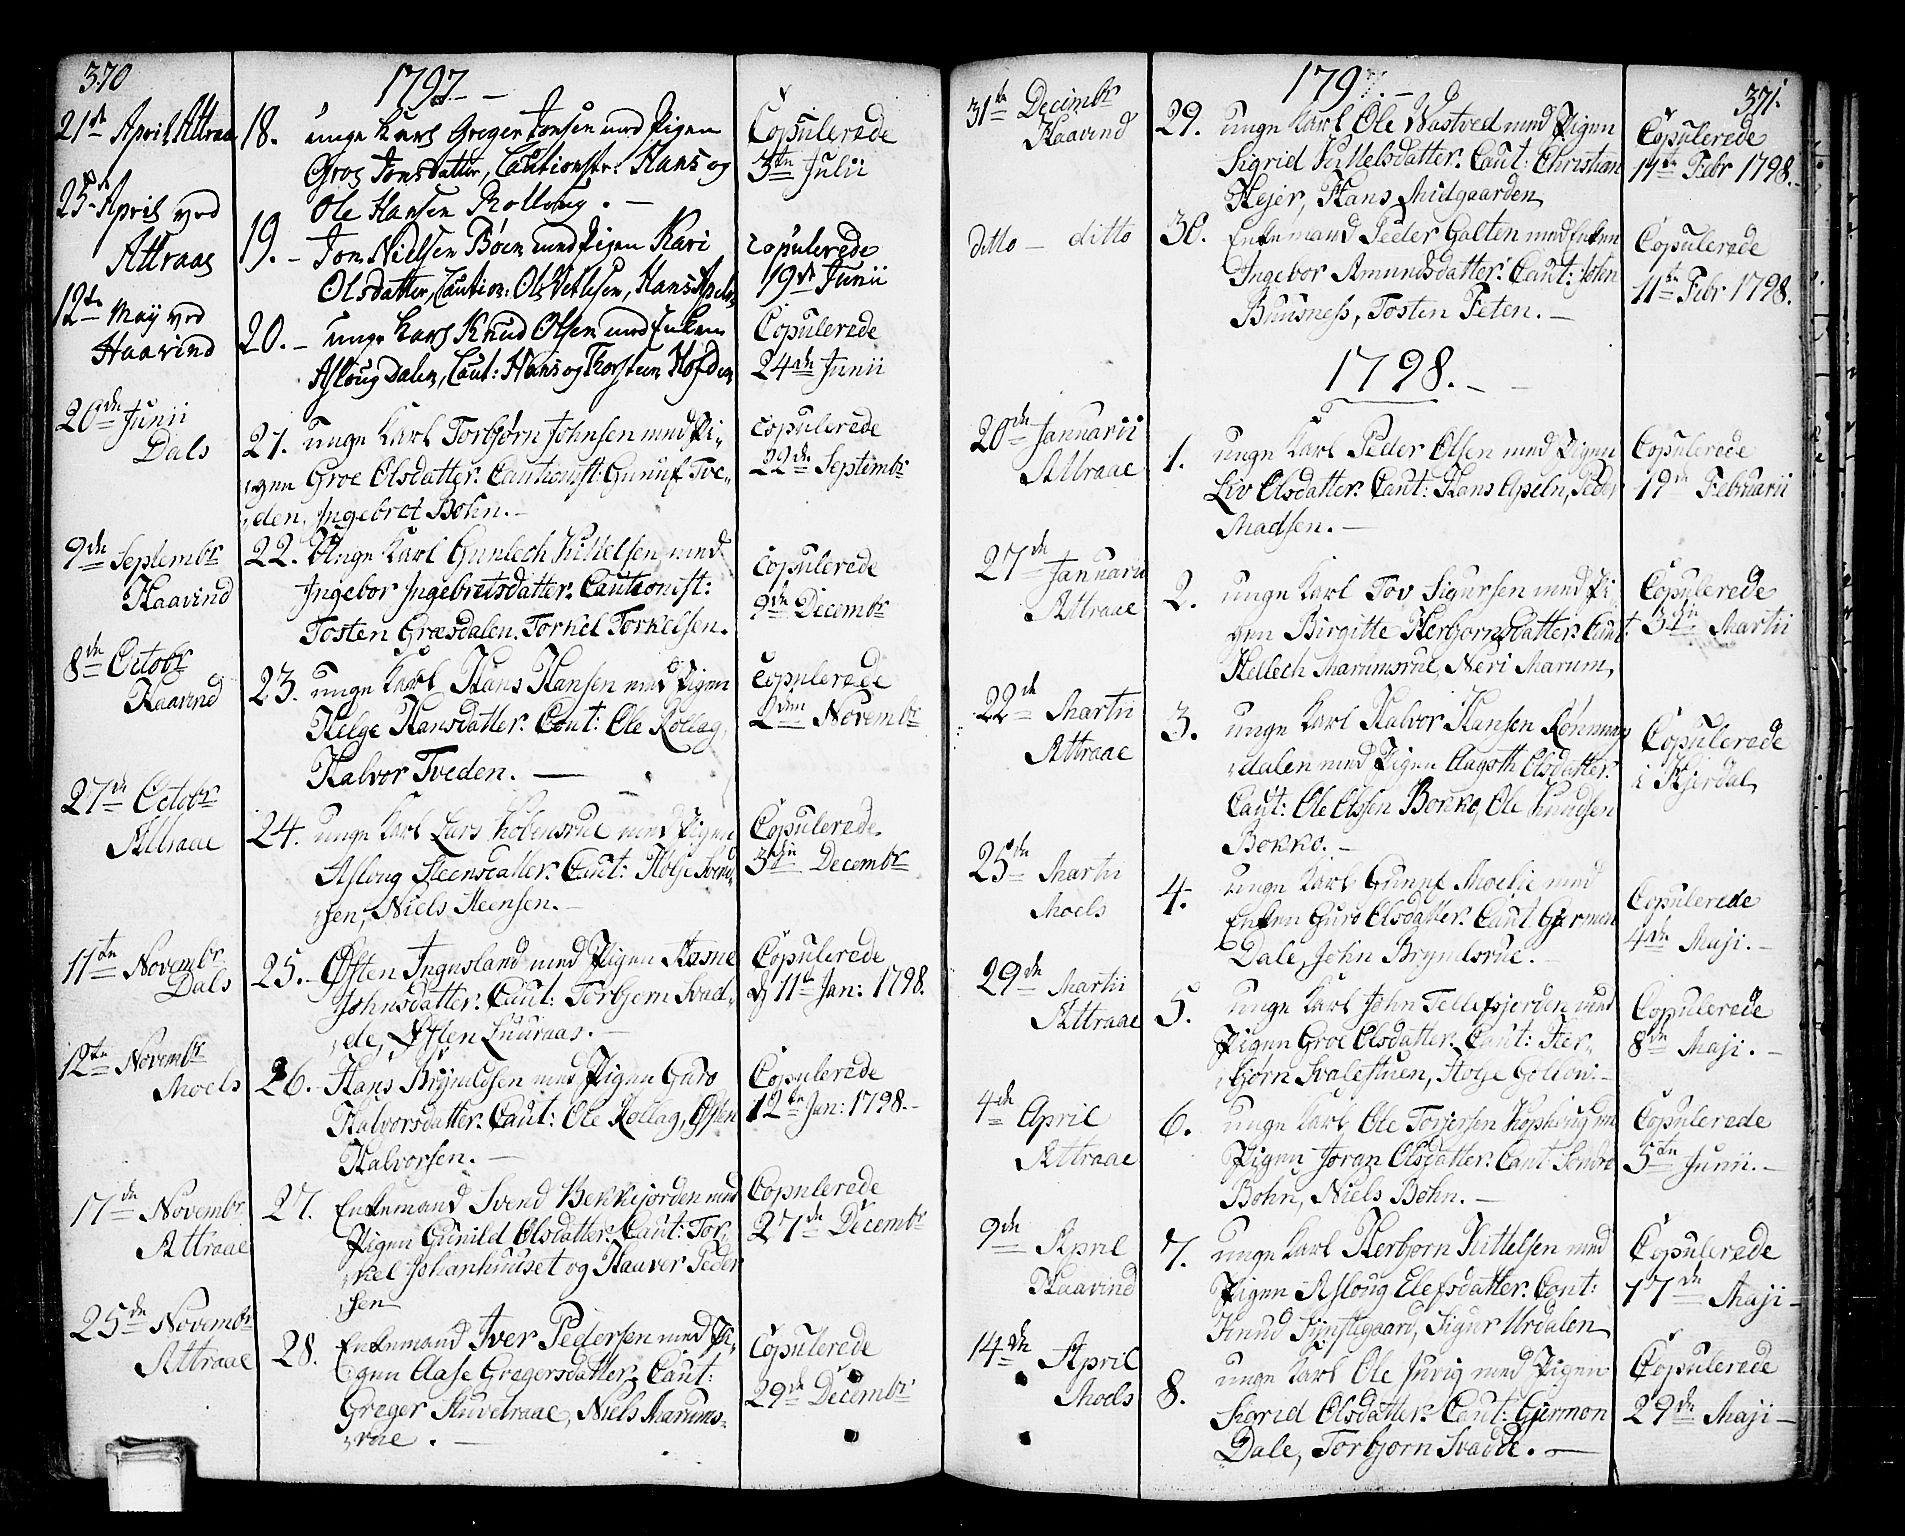 SAKO, Tinn kirkebøker, F/Fa/L0002: Ministerialbok nr. I 2, 1757-1810, s. 370-371